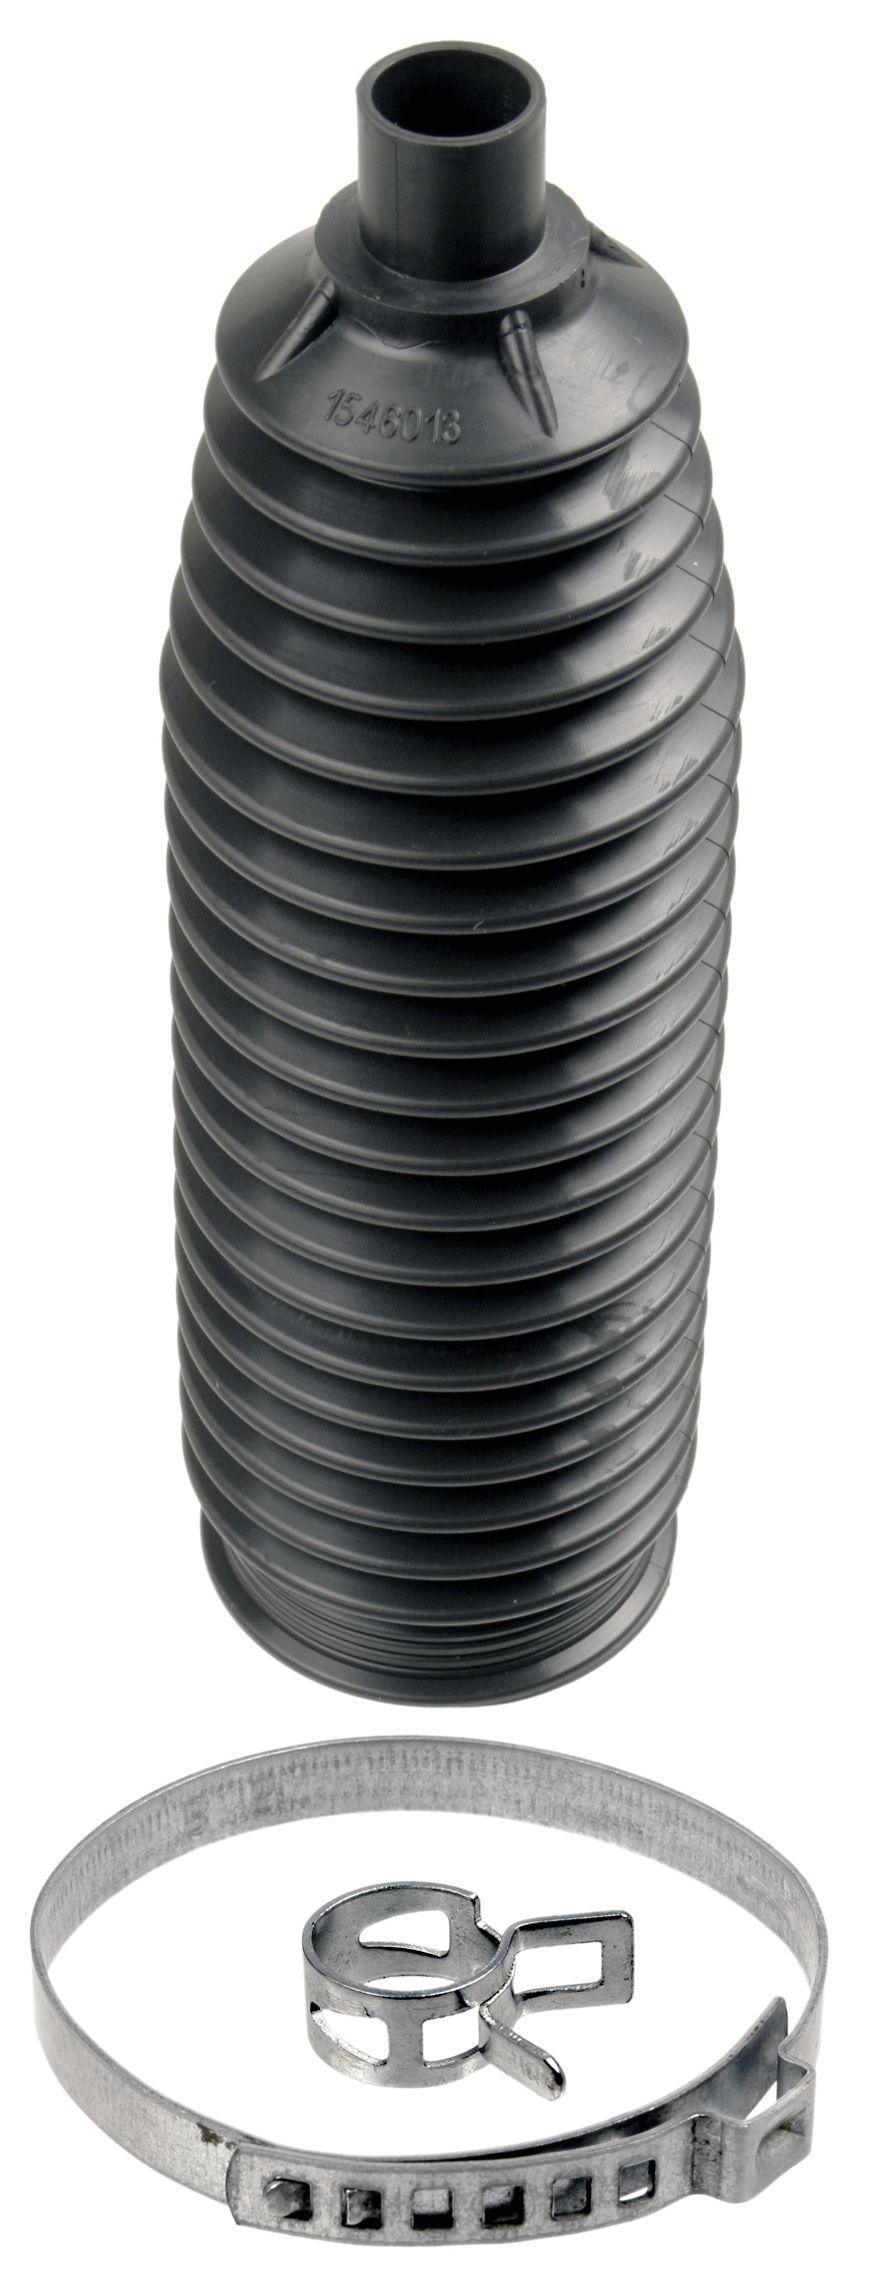 OPEL ASTRA 2020 Faltenbalg Lenkung - Original TRW JBE394 Innendurchmesser 2: 15,5mm, Innendurchmesser 2: 52mm